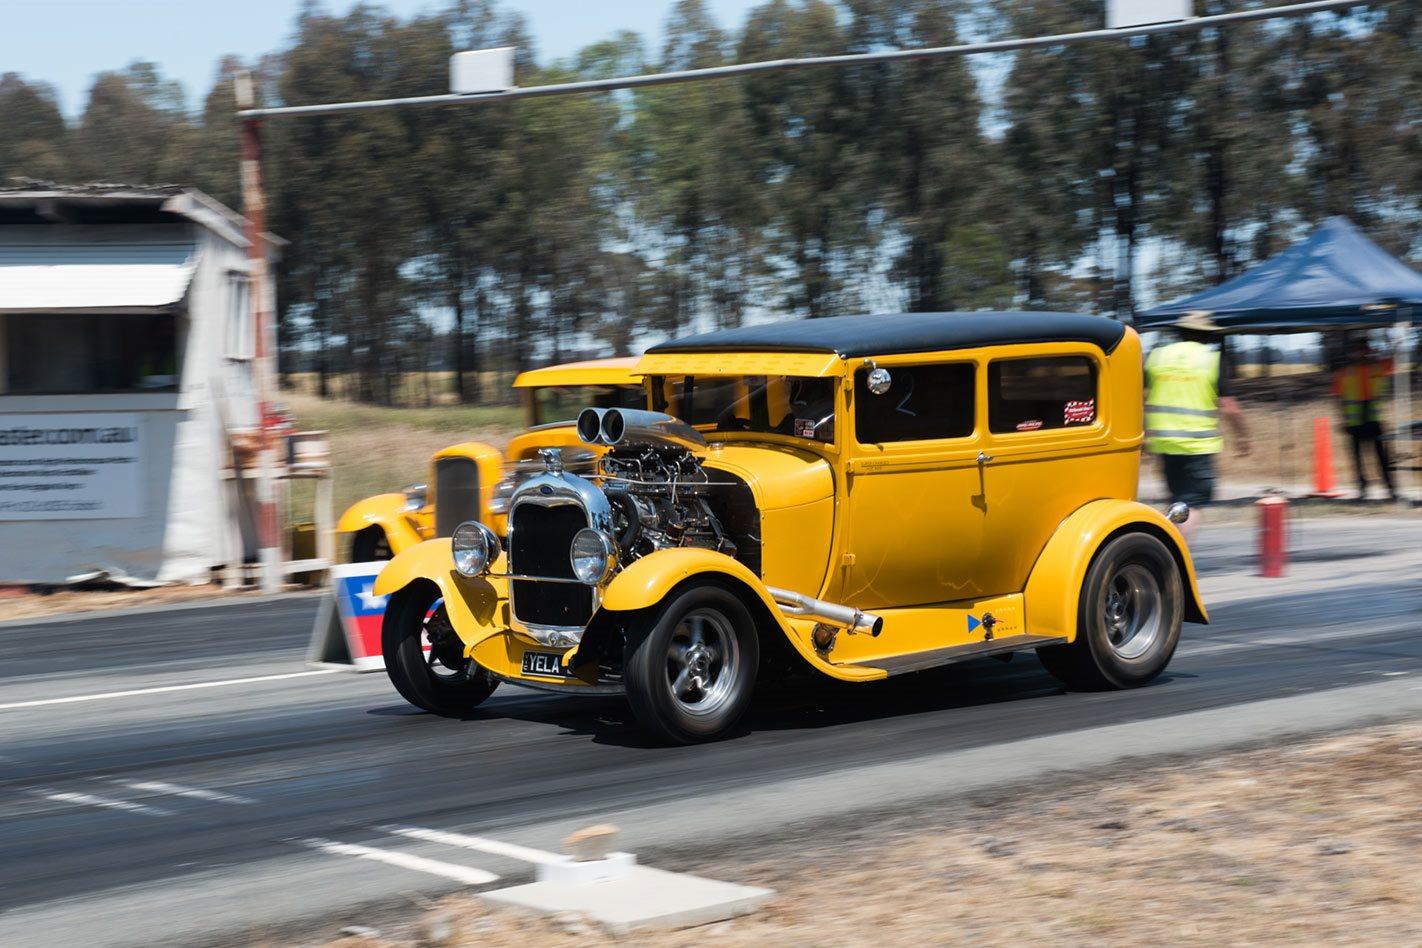 chev powered 1928 Tudor